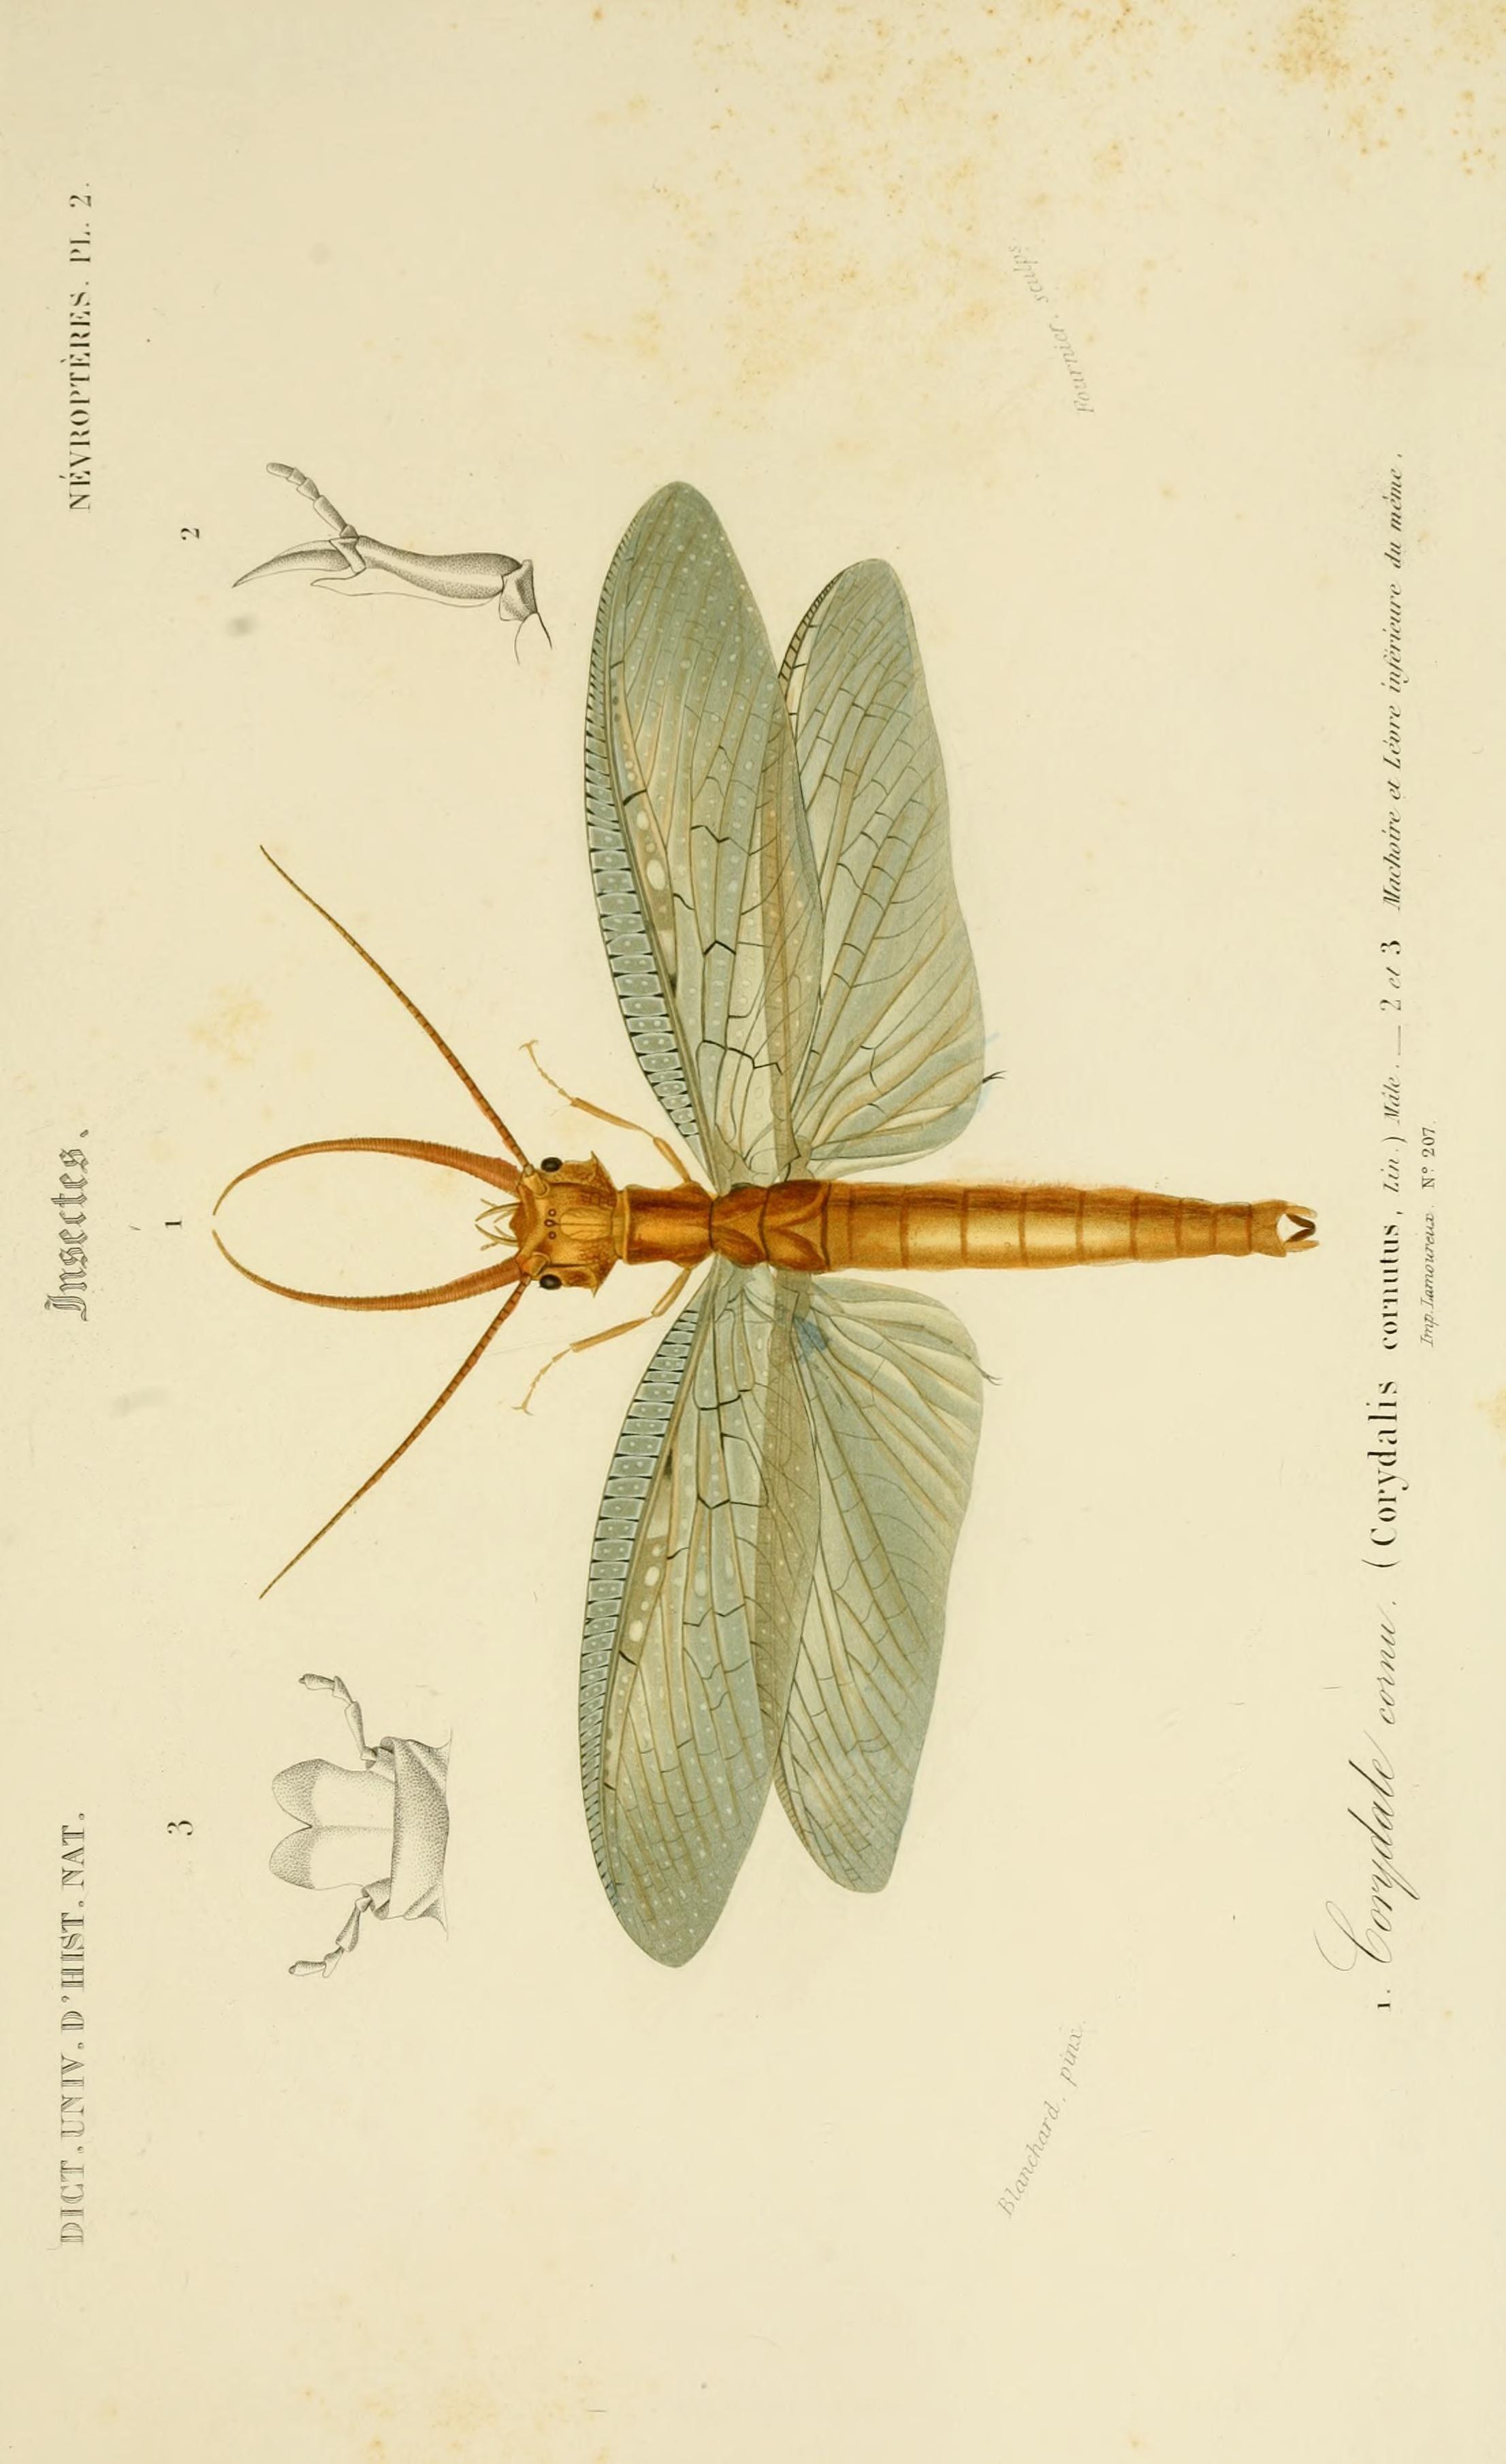 Dragonfly sketch- fastest predato in the Entomology world! | pintura ...